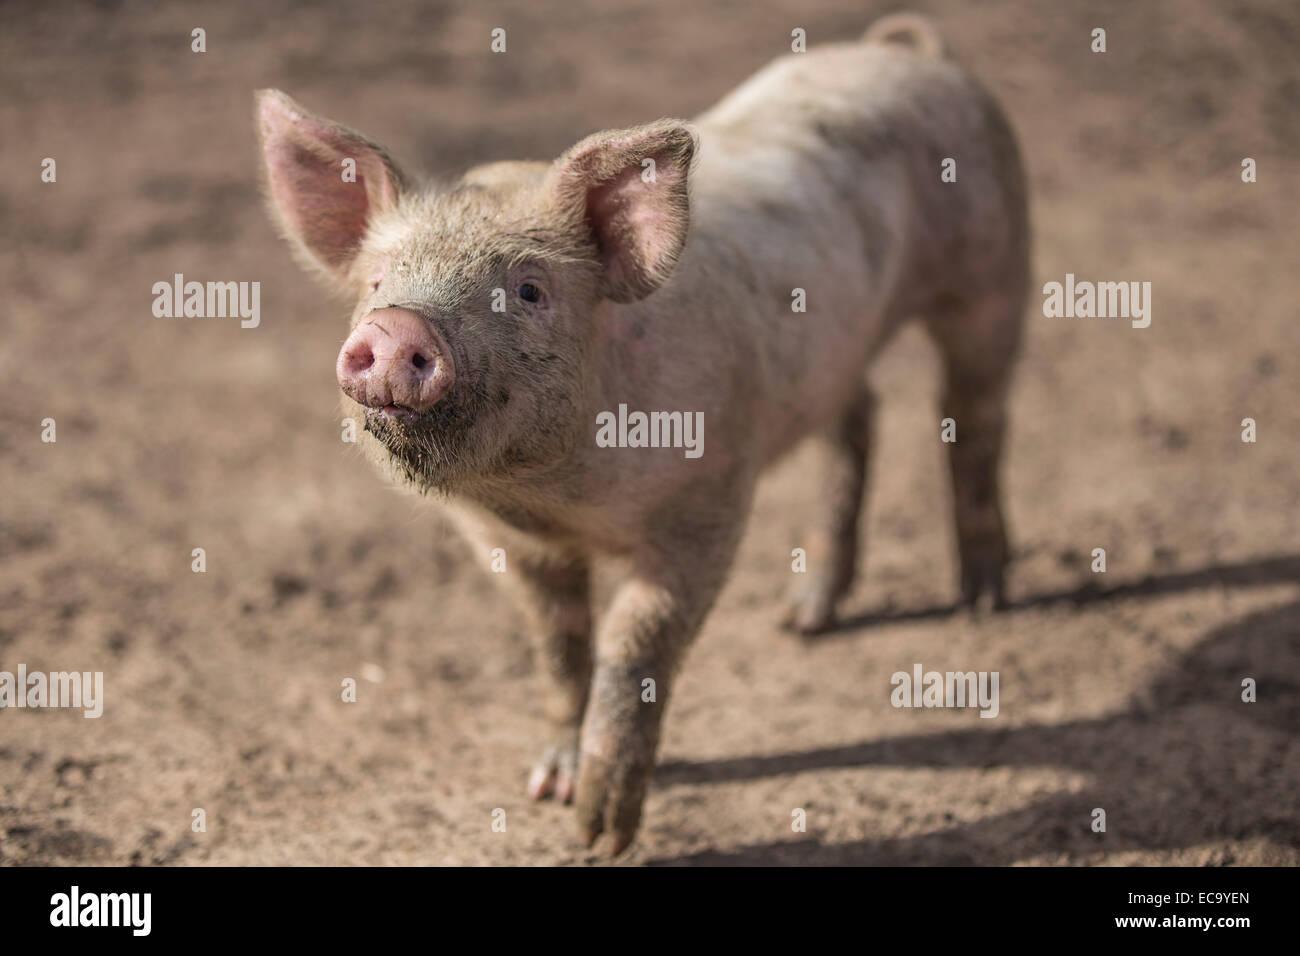 Muddy piglet Stock Photo